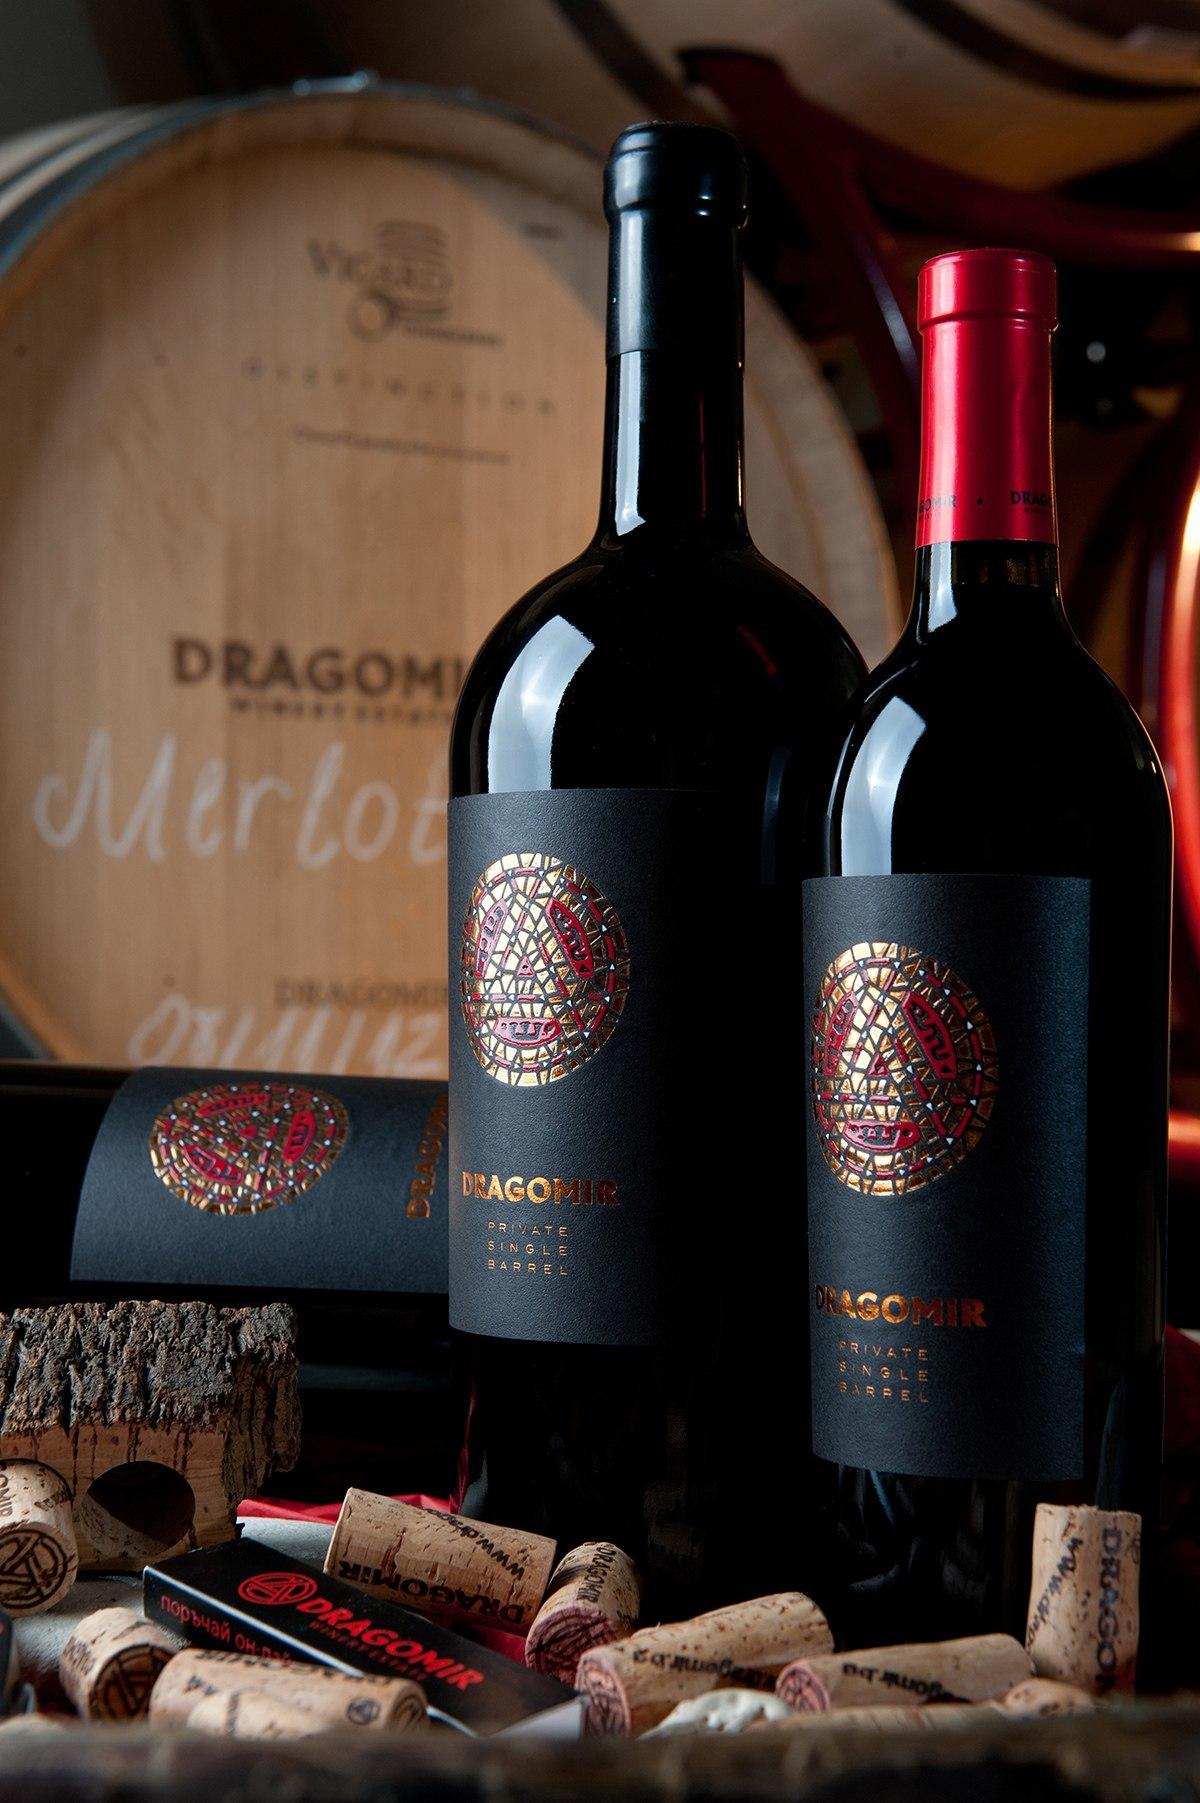 Dragomir Reserve wine label